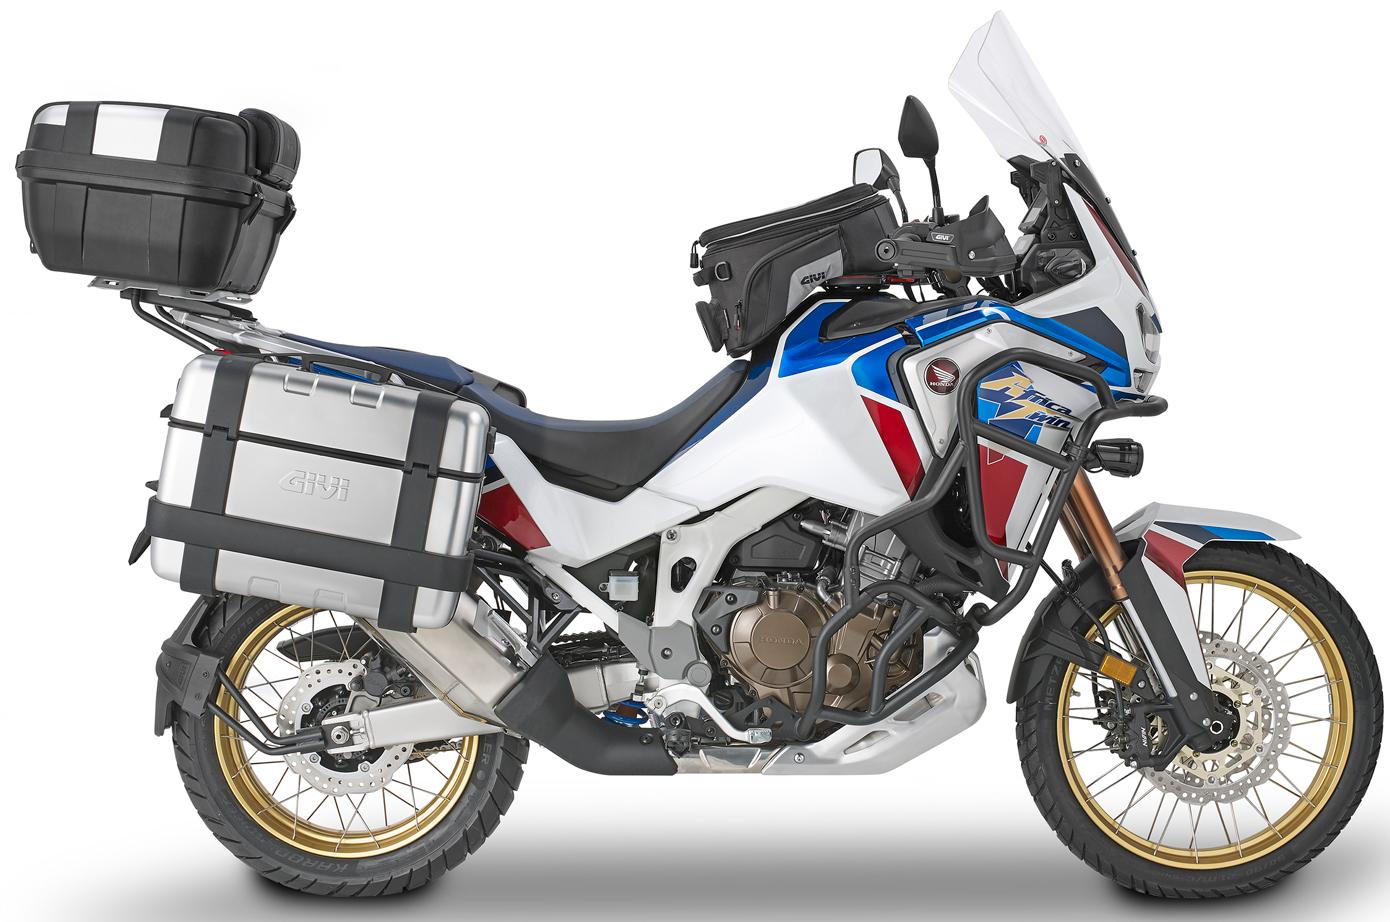 Extensi/ón de Caballete Lateral ES1178 GIVI Compatible con Honda CRF 1100 L Africa Twin Adventure Sport 2020 EST.CAV-197